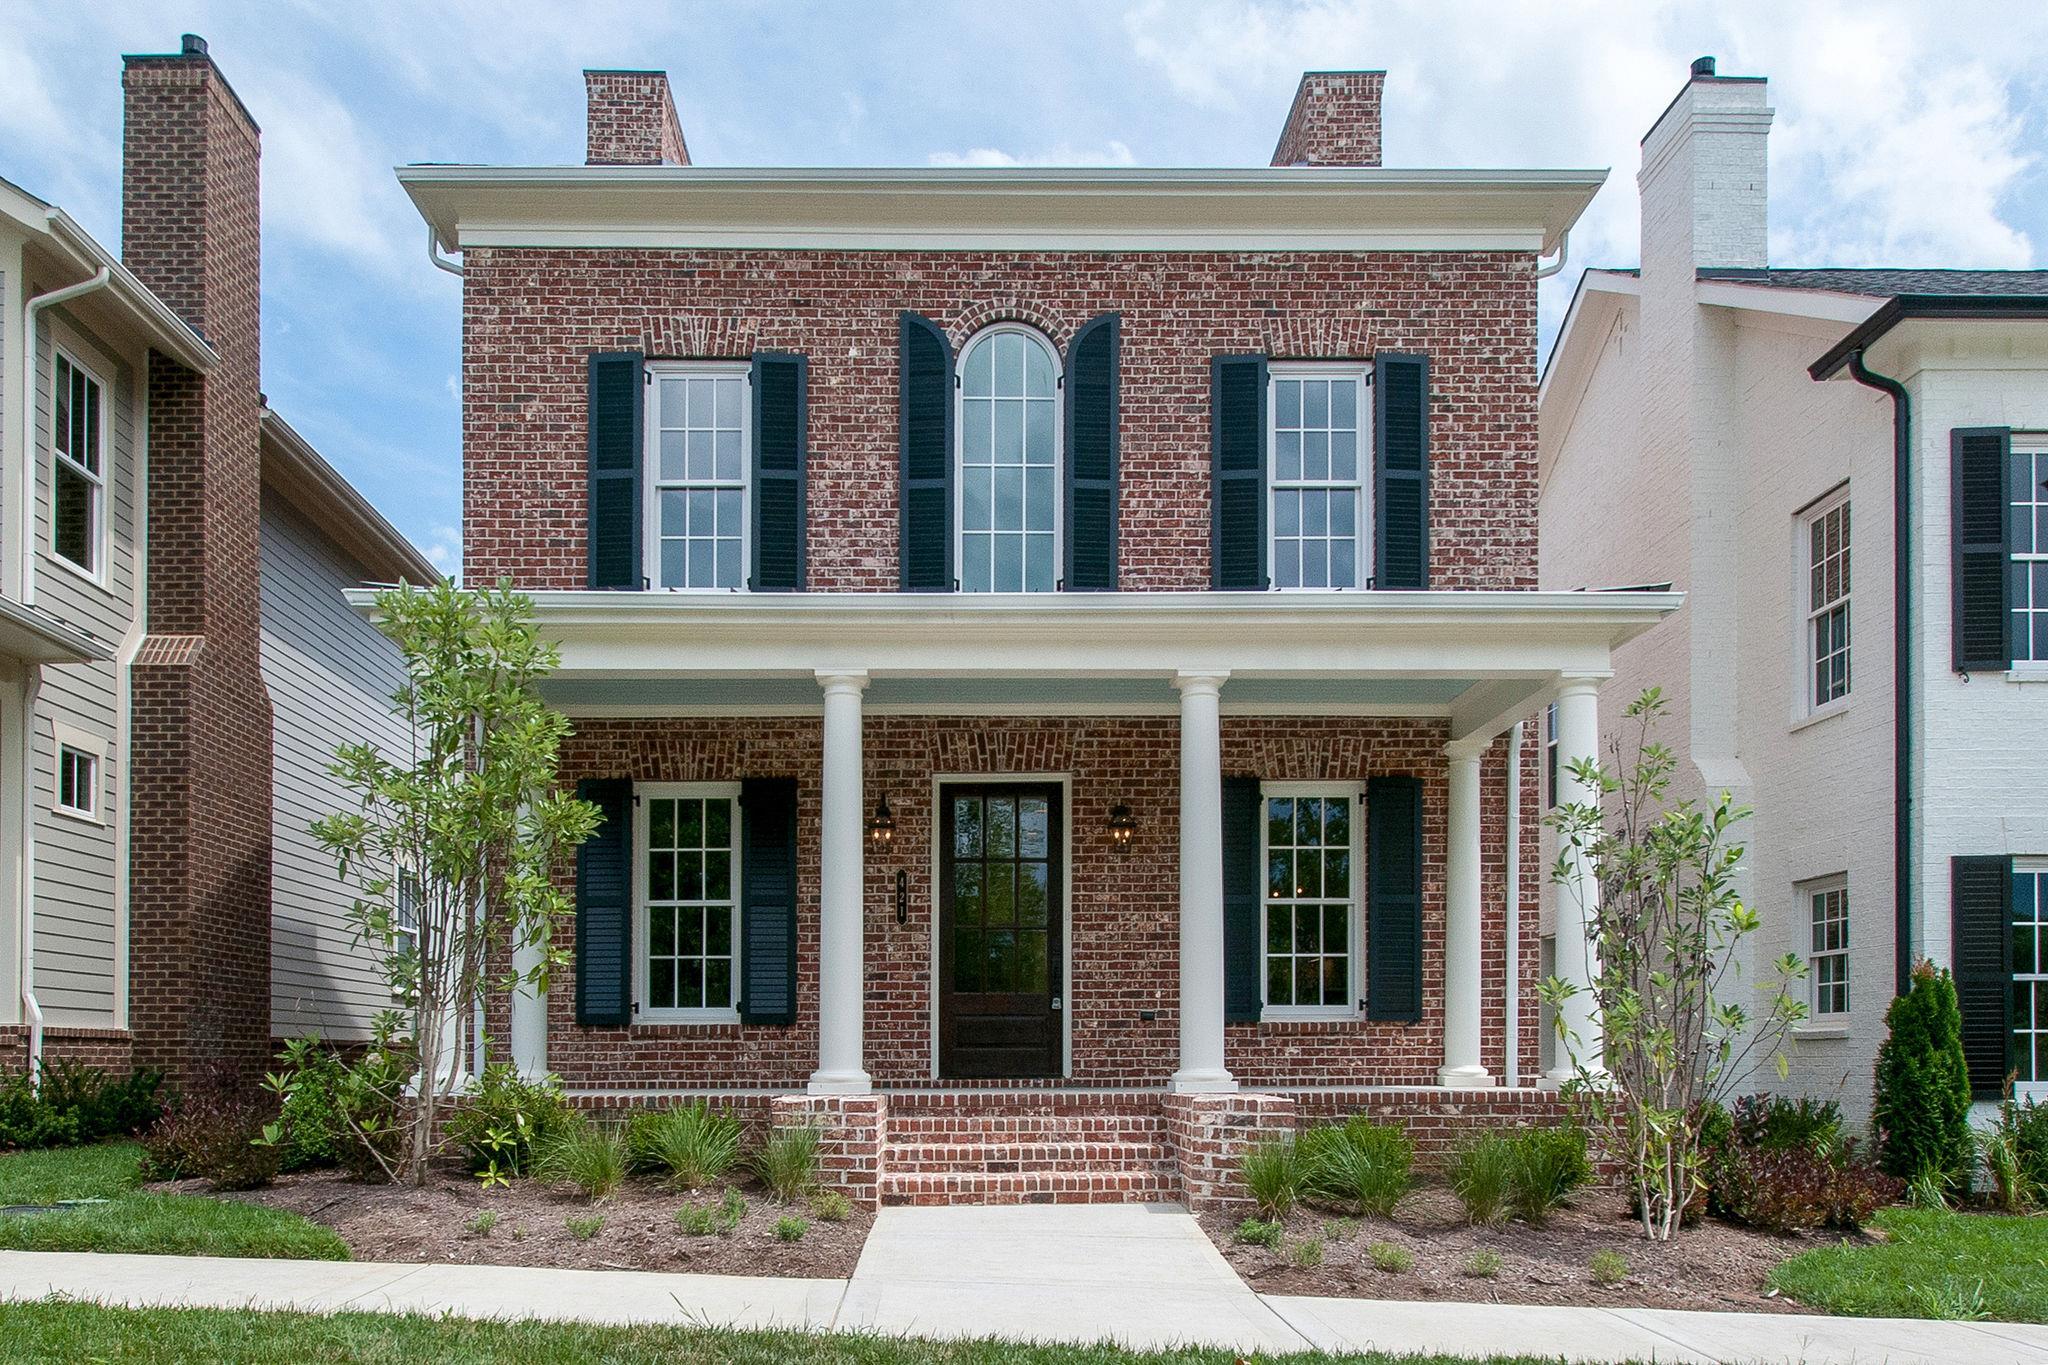 421 Stephens Valley Blvd (105), Nashville, TN 37221 - Nashville, TN real estate listing